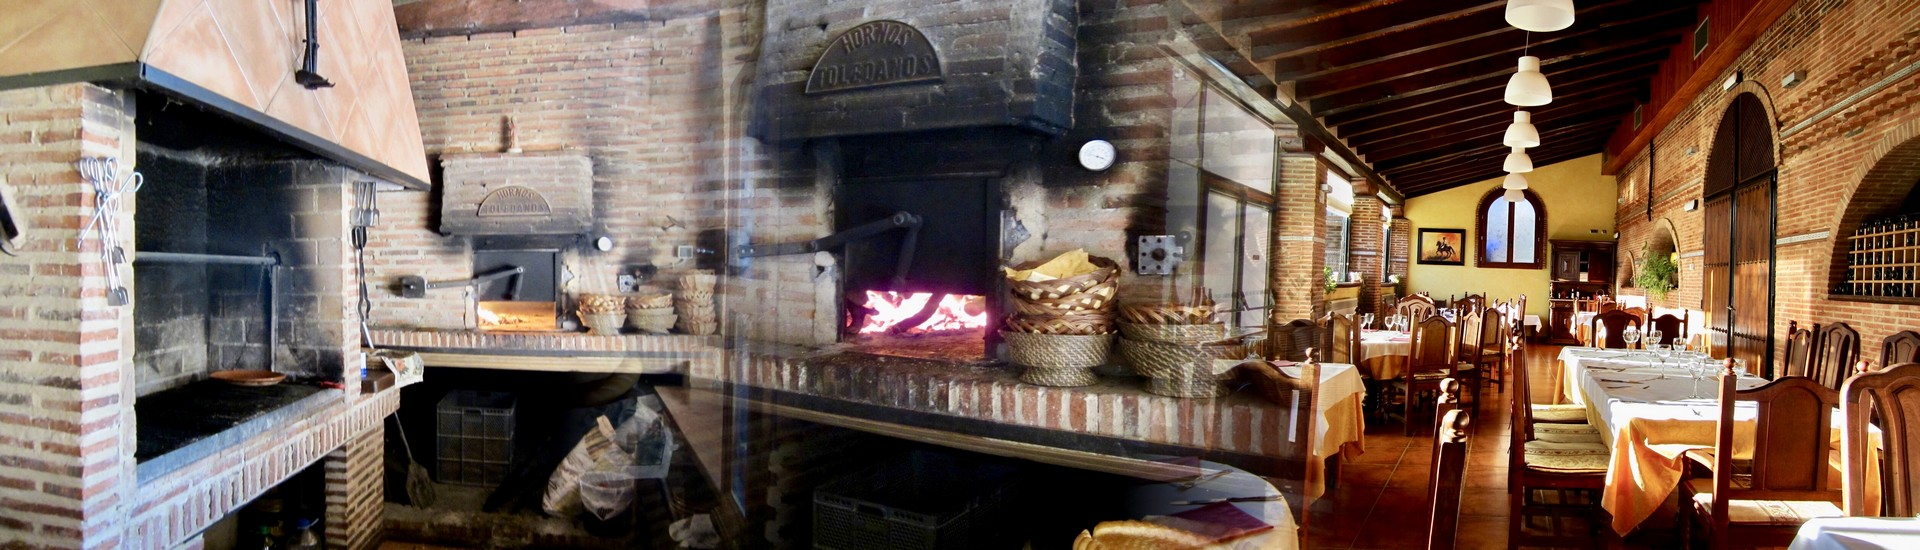 restaurante la alcazaba, la alcazaba palencia, horno de leña en palencia